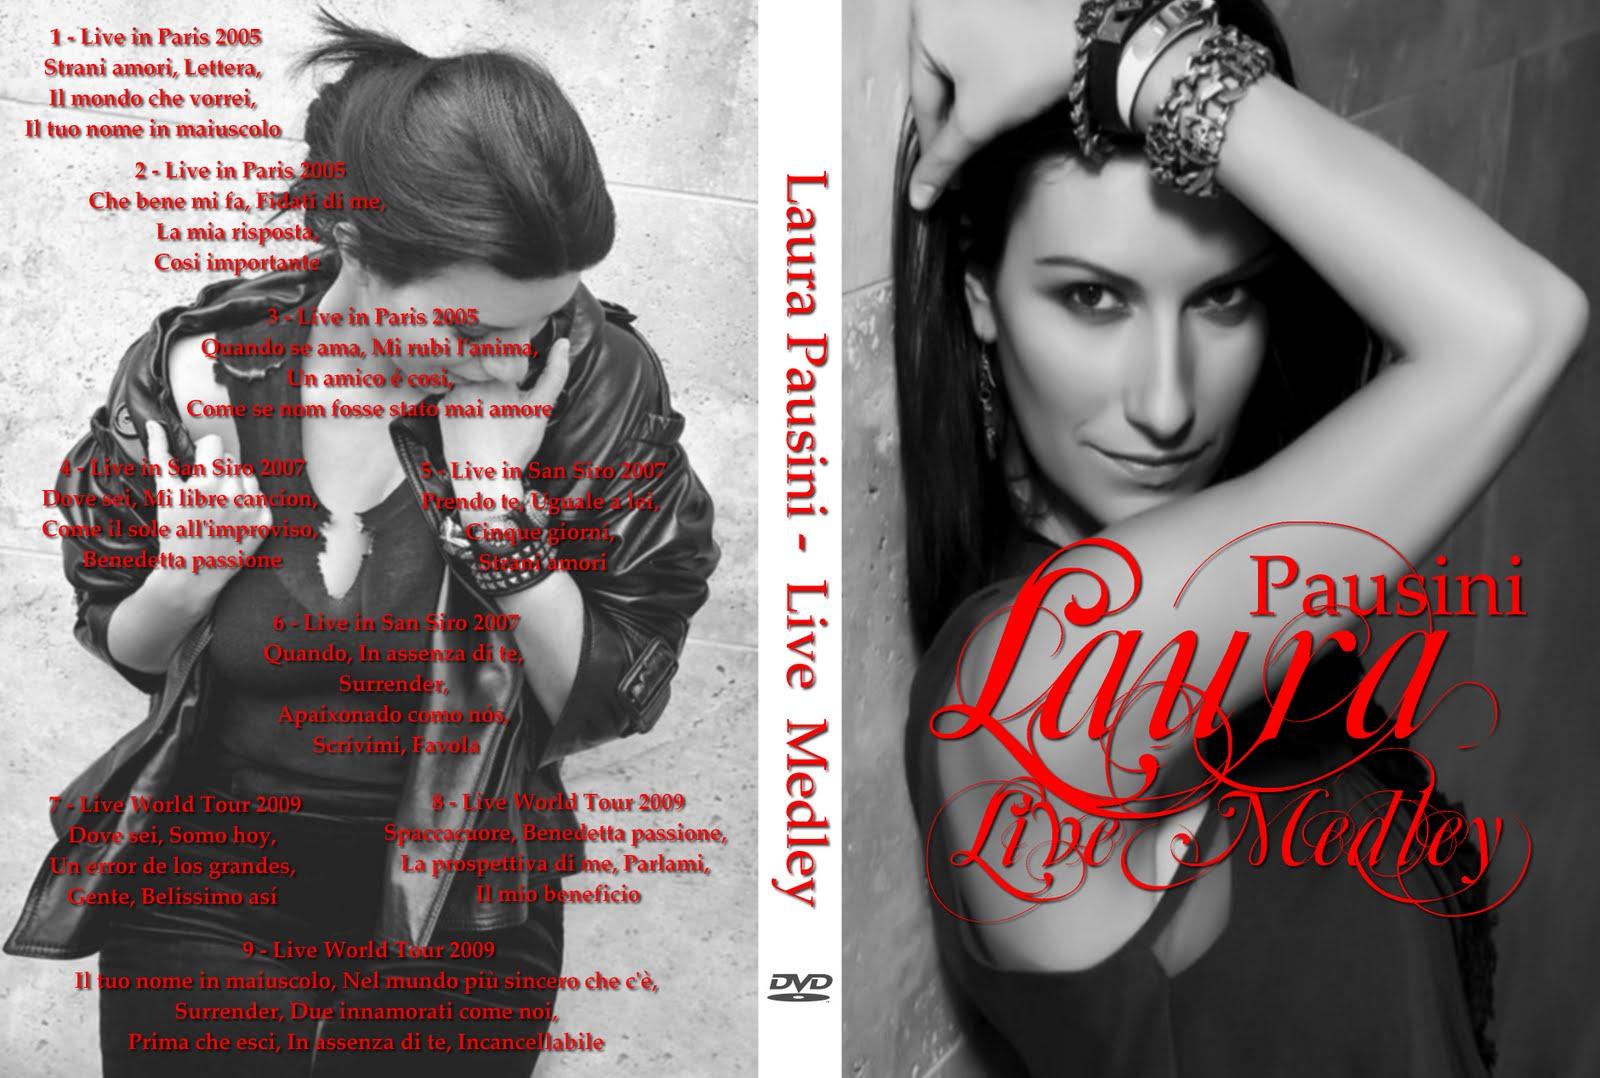 http://2.bp.blogspot.com/_wI4aSCdHtnw/TI1EbKjSBrI/AAAAAAAAANs/_A95pvpU7V8/s1600/Laura+Medley+Live.jpg